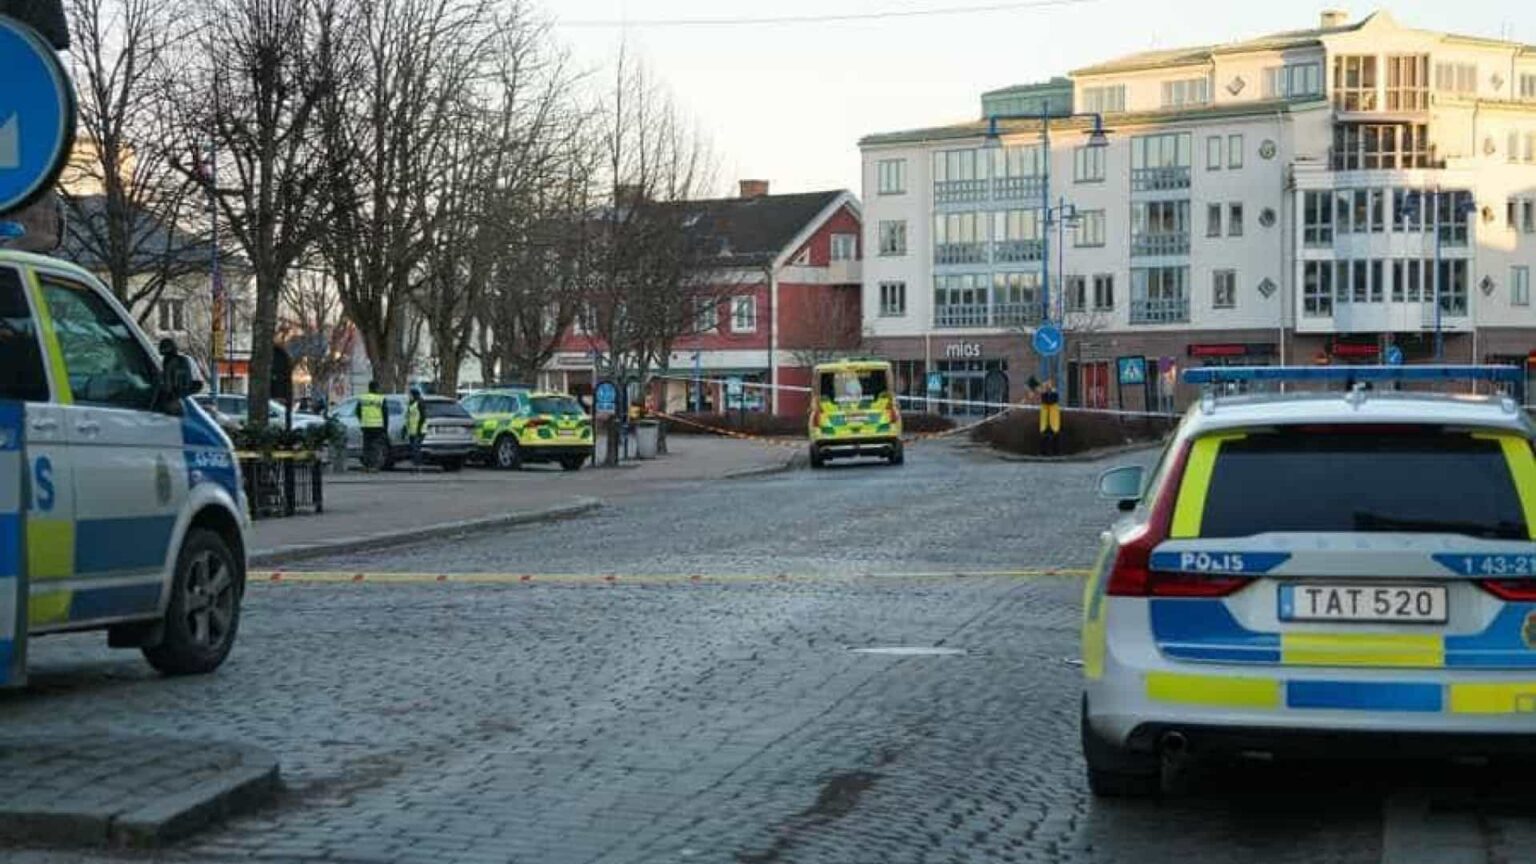 Suspeita de terrorismo: oito feridos em esfaqueamento na Suécia